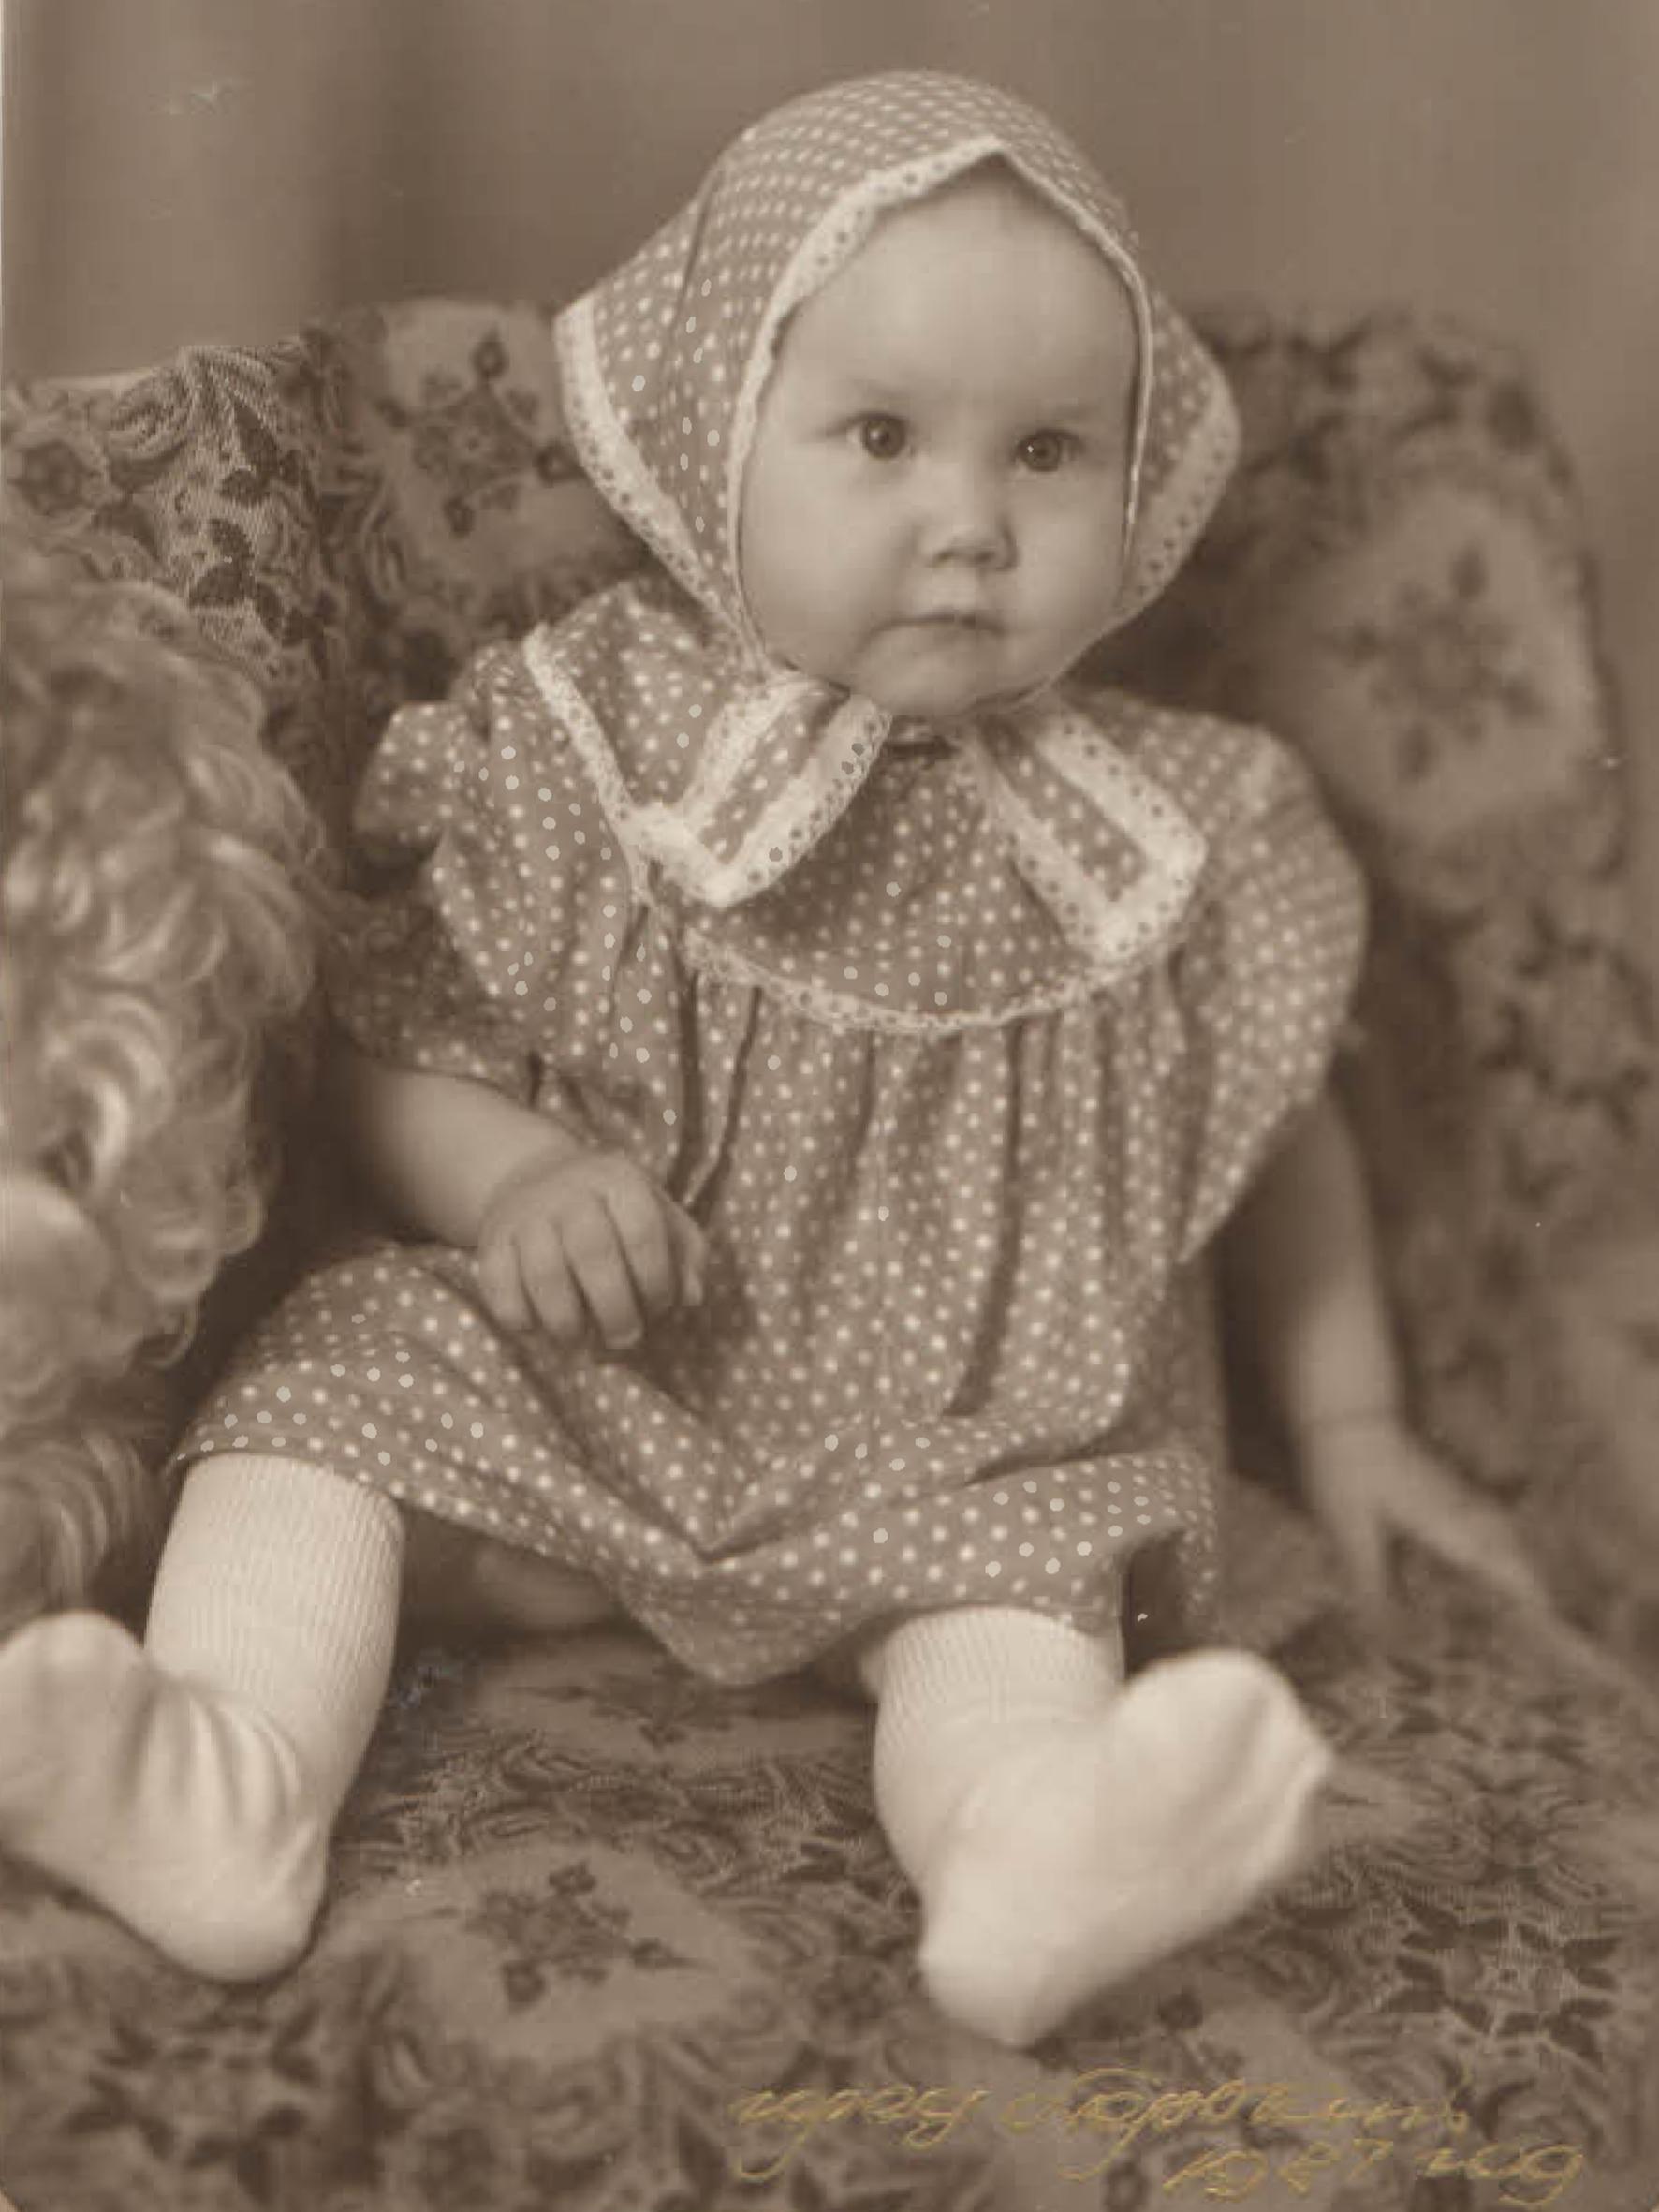 Моя кукла 30 лет назад - само очарование. Само очарование